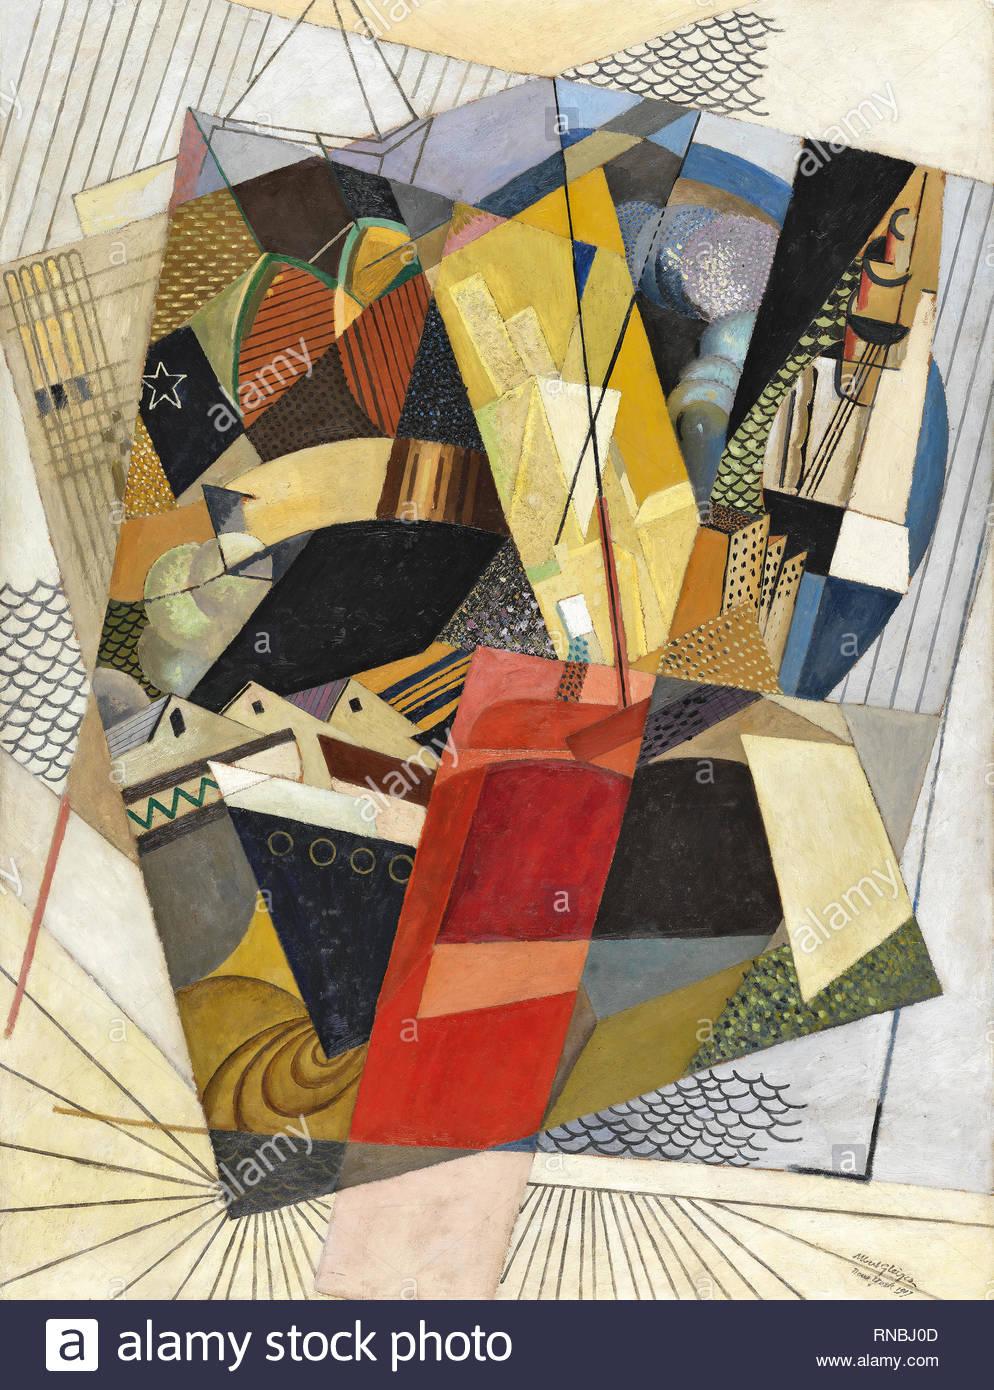 Albert Gleizes (Paris, 1881-Avignon, 1953). In Port (1917). Oil and sand on cardboard. 153 x 120 cm. Museum: Museo Nacional Thyssen-Bornemisza, Madrid. - Stock Image